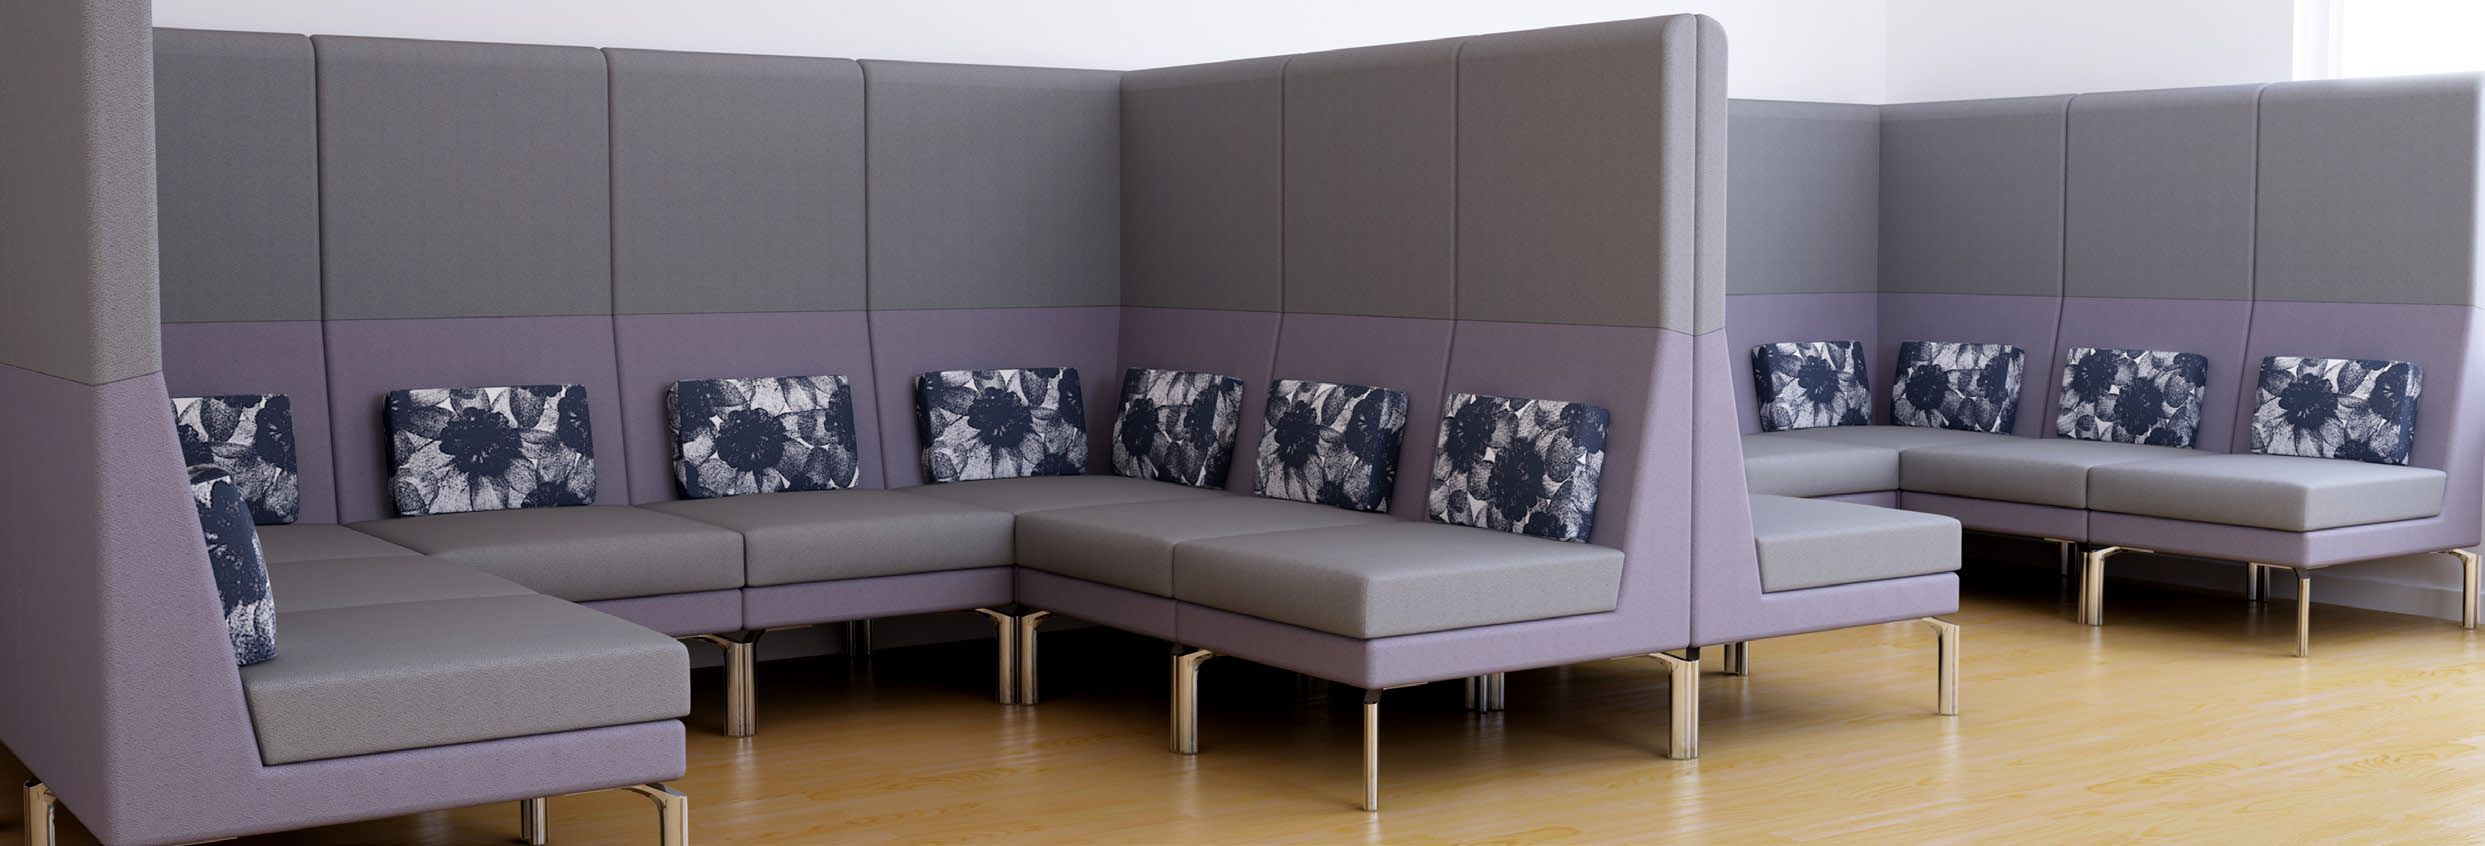 Sillones modernos individuales 4 articulos interesantes - Sofas individuales modernos ...